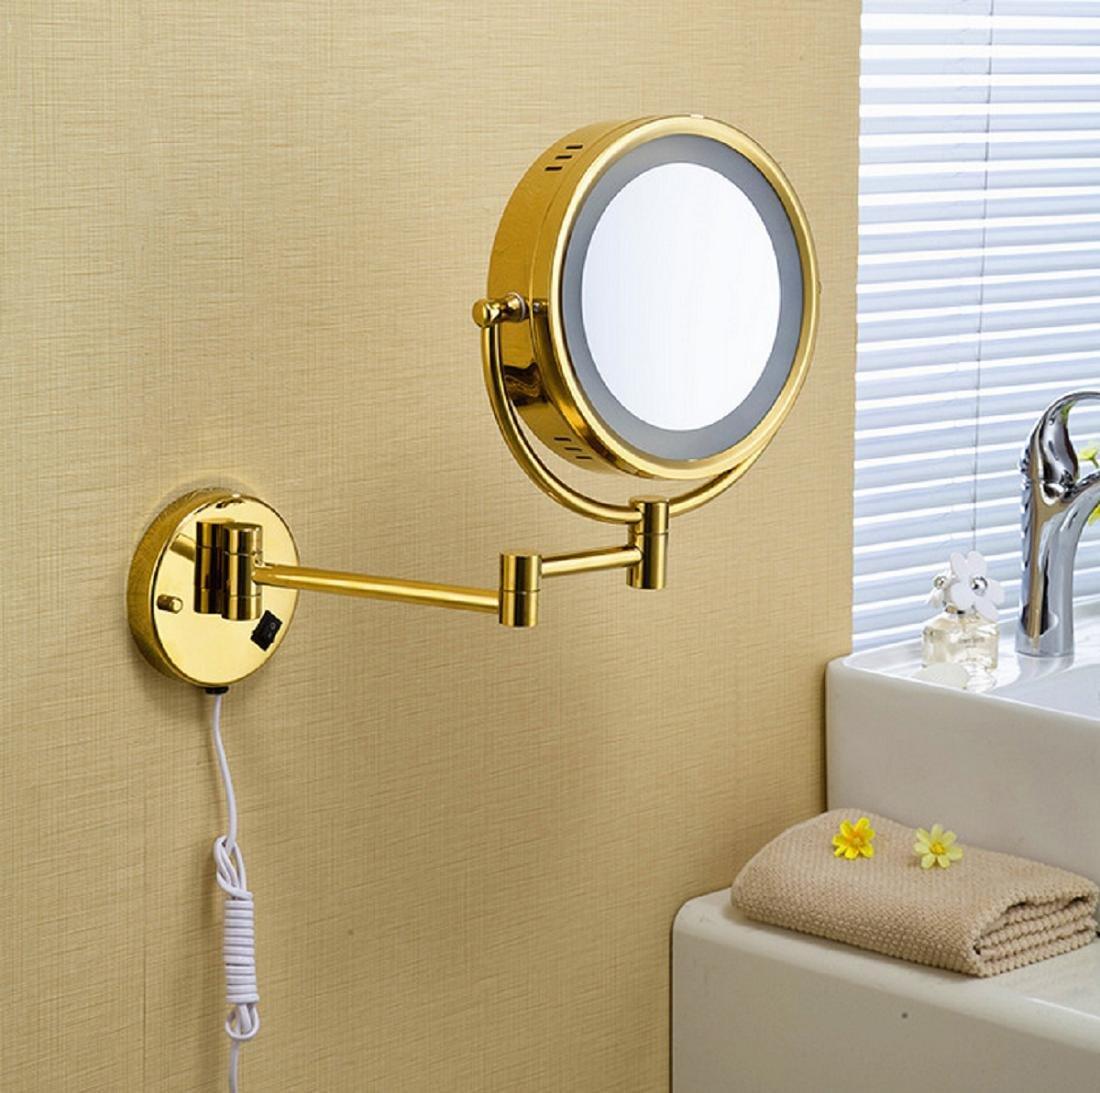 GAOJIAN Bath Mirror 8'' Round Wall Cosmetic Mirrors 3x 1x Magnifying Mirrors LED Brass Golden Folding Bathroom Makeup Light Mirror